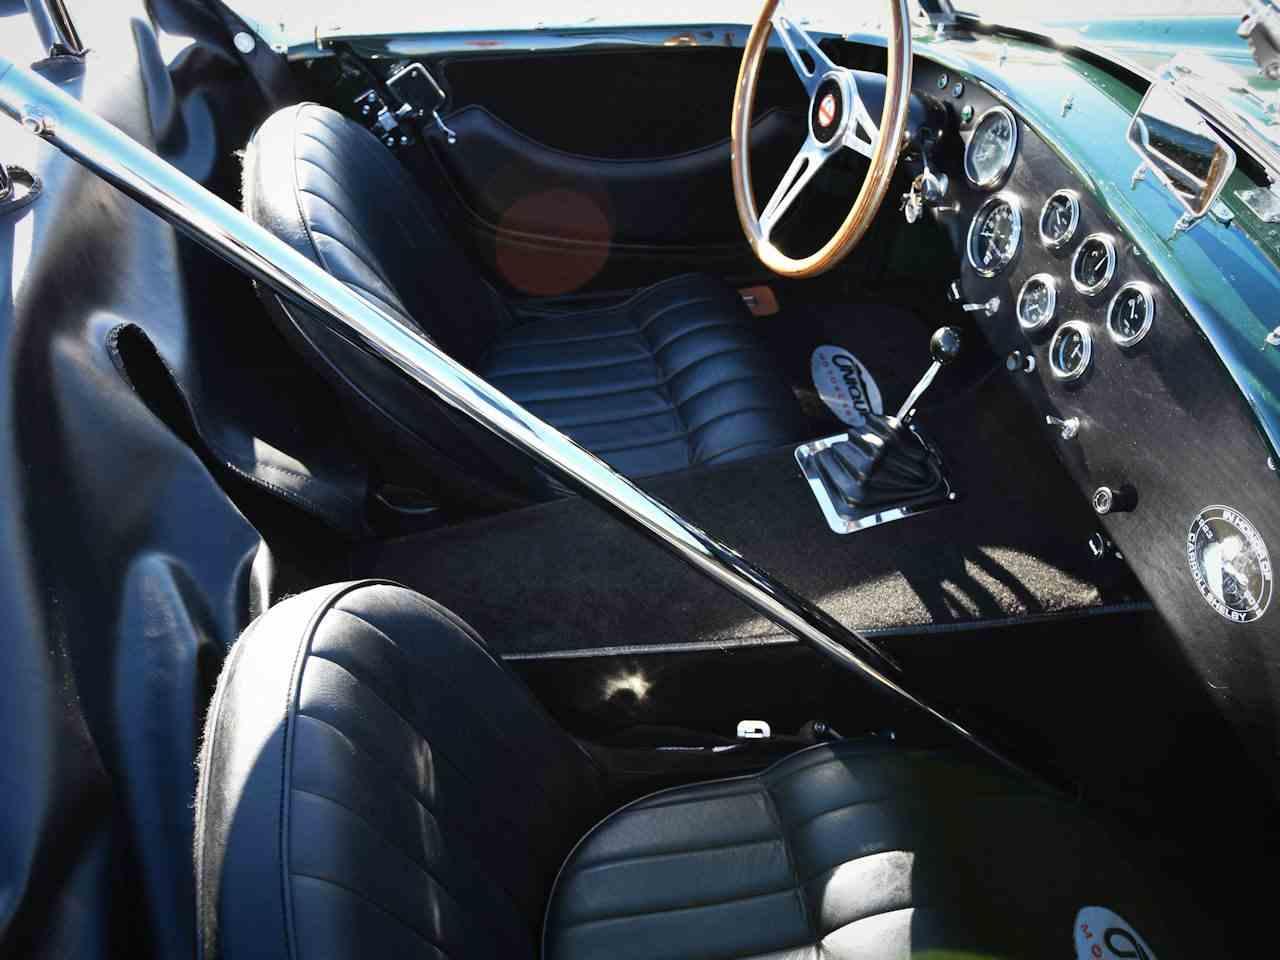 1964 Unique Motor Cars Cobra for Sale   ClassicCars.com   CC-1044745